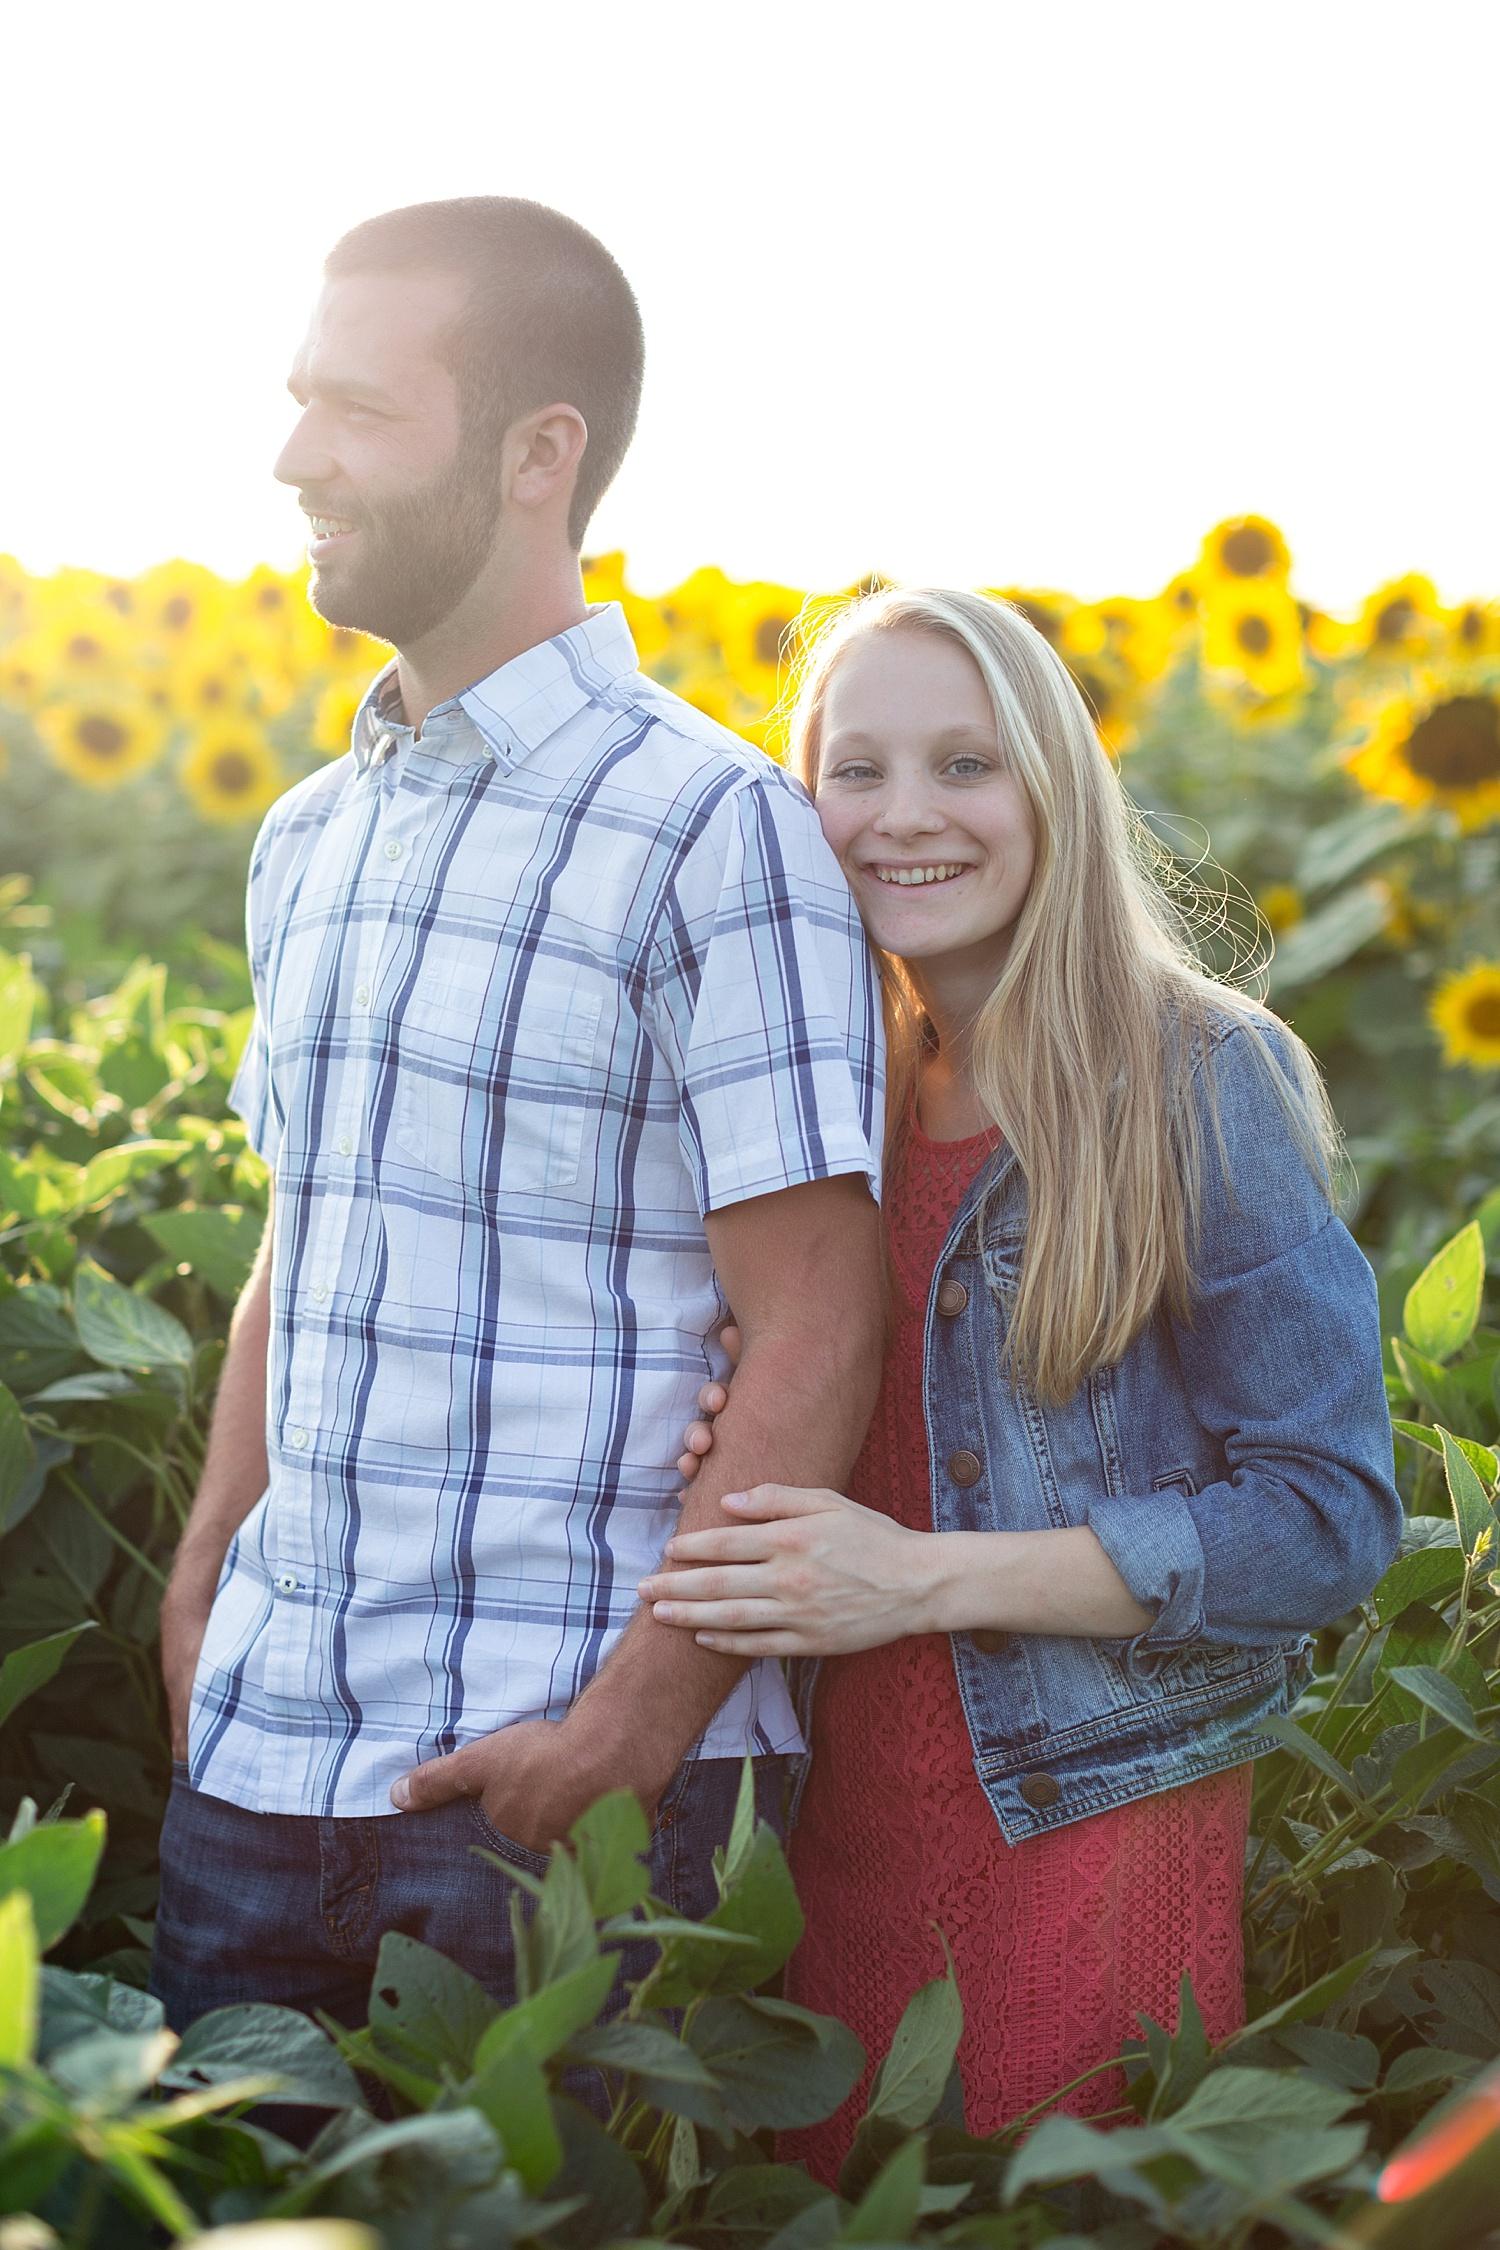 Romantic engagement session in sunflower field lancaster pa wedding photographer photo_0012.jpg